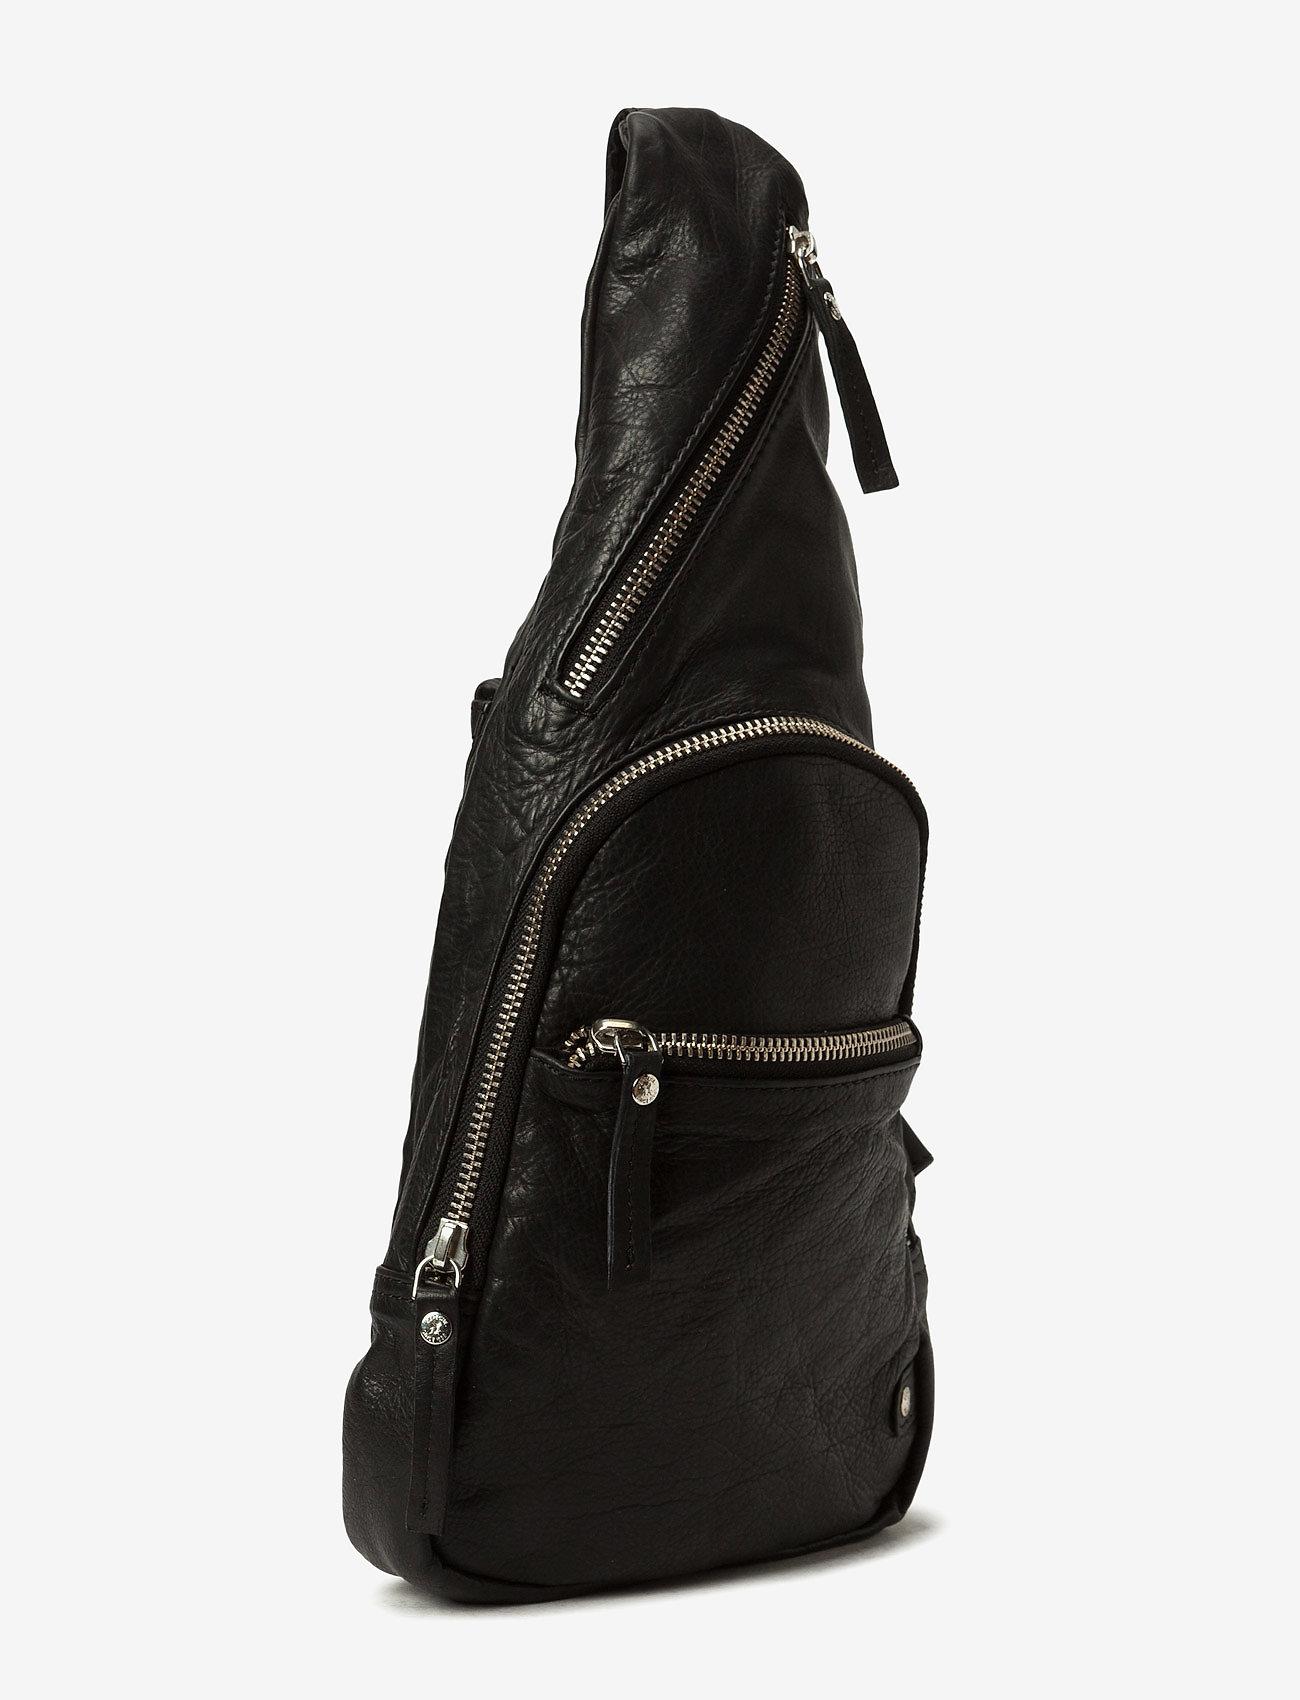 DEPECHE - Bum bag - mugursomas - black - 1